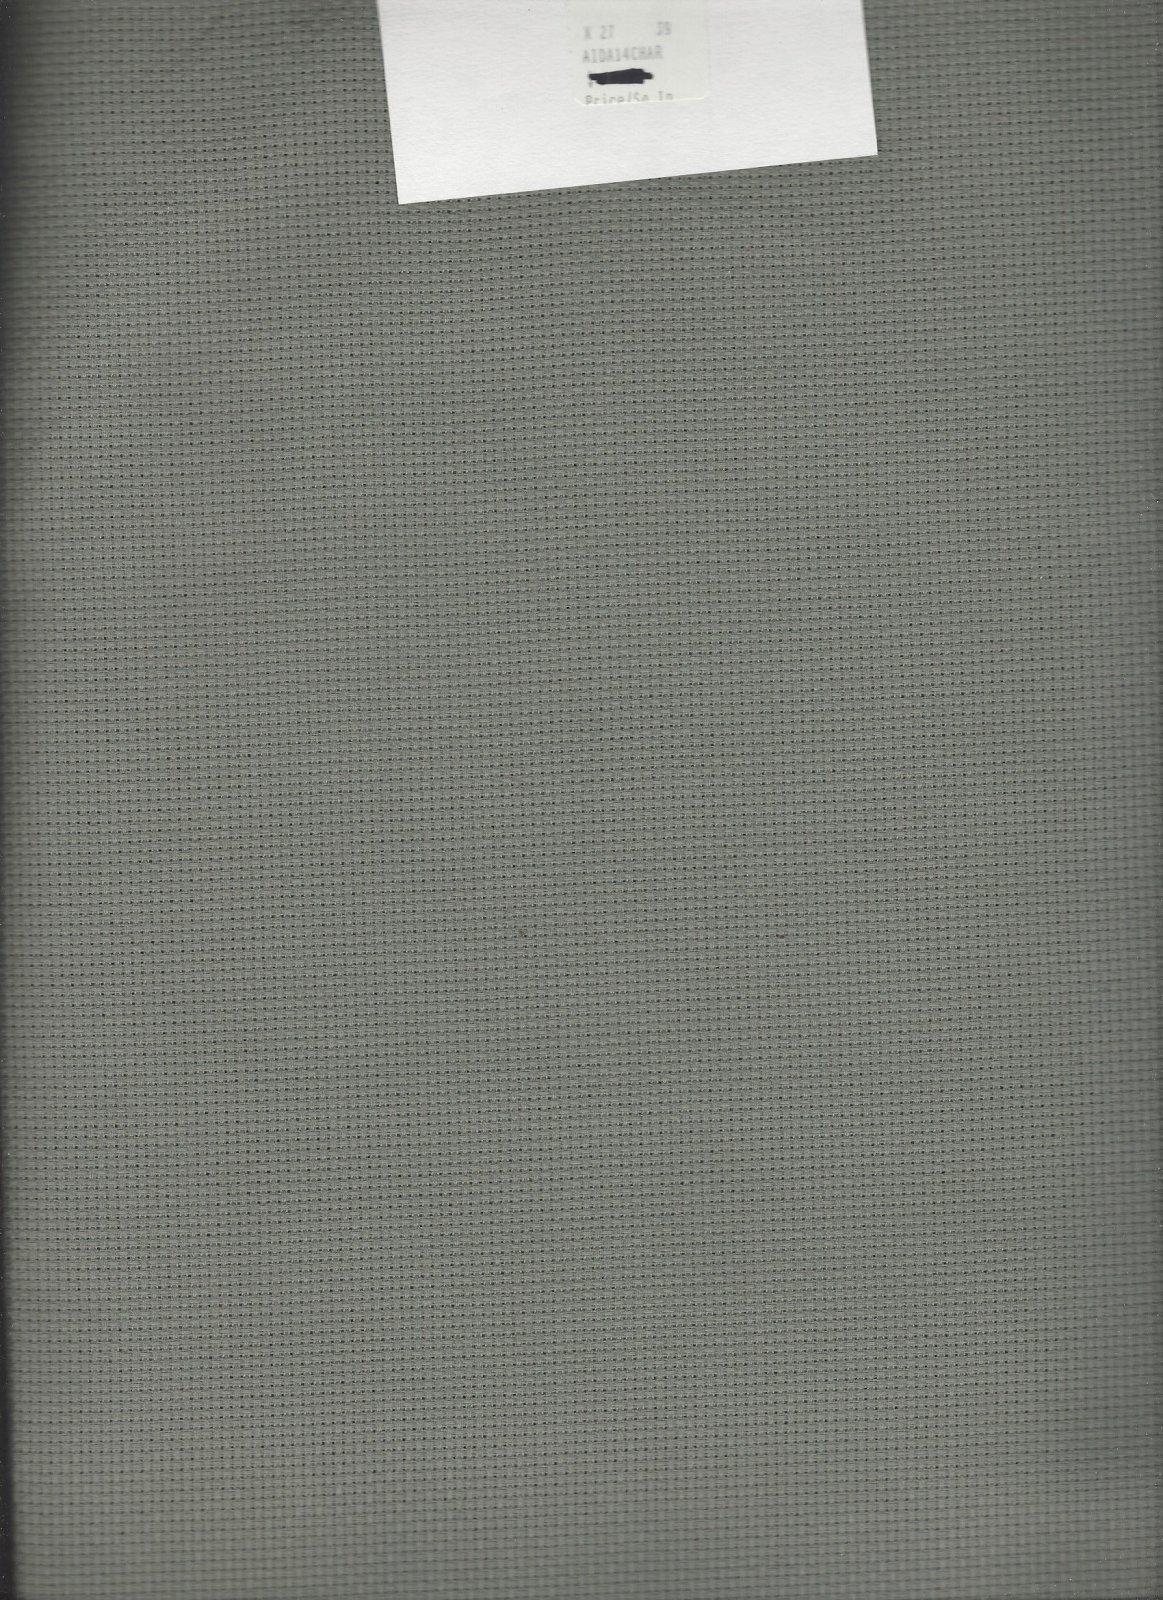 Aida 14ct Charcoal/Smokey Green (discontinued color)